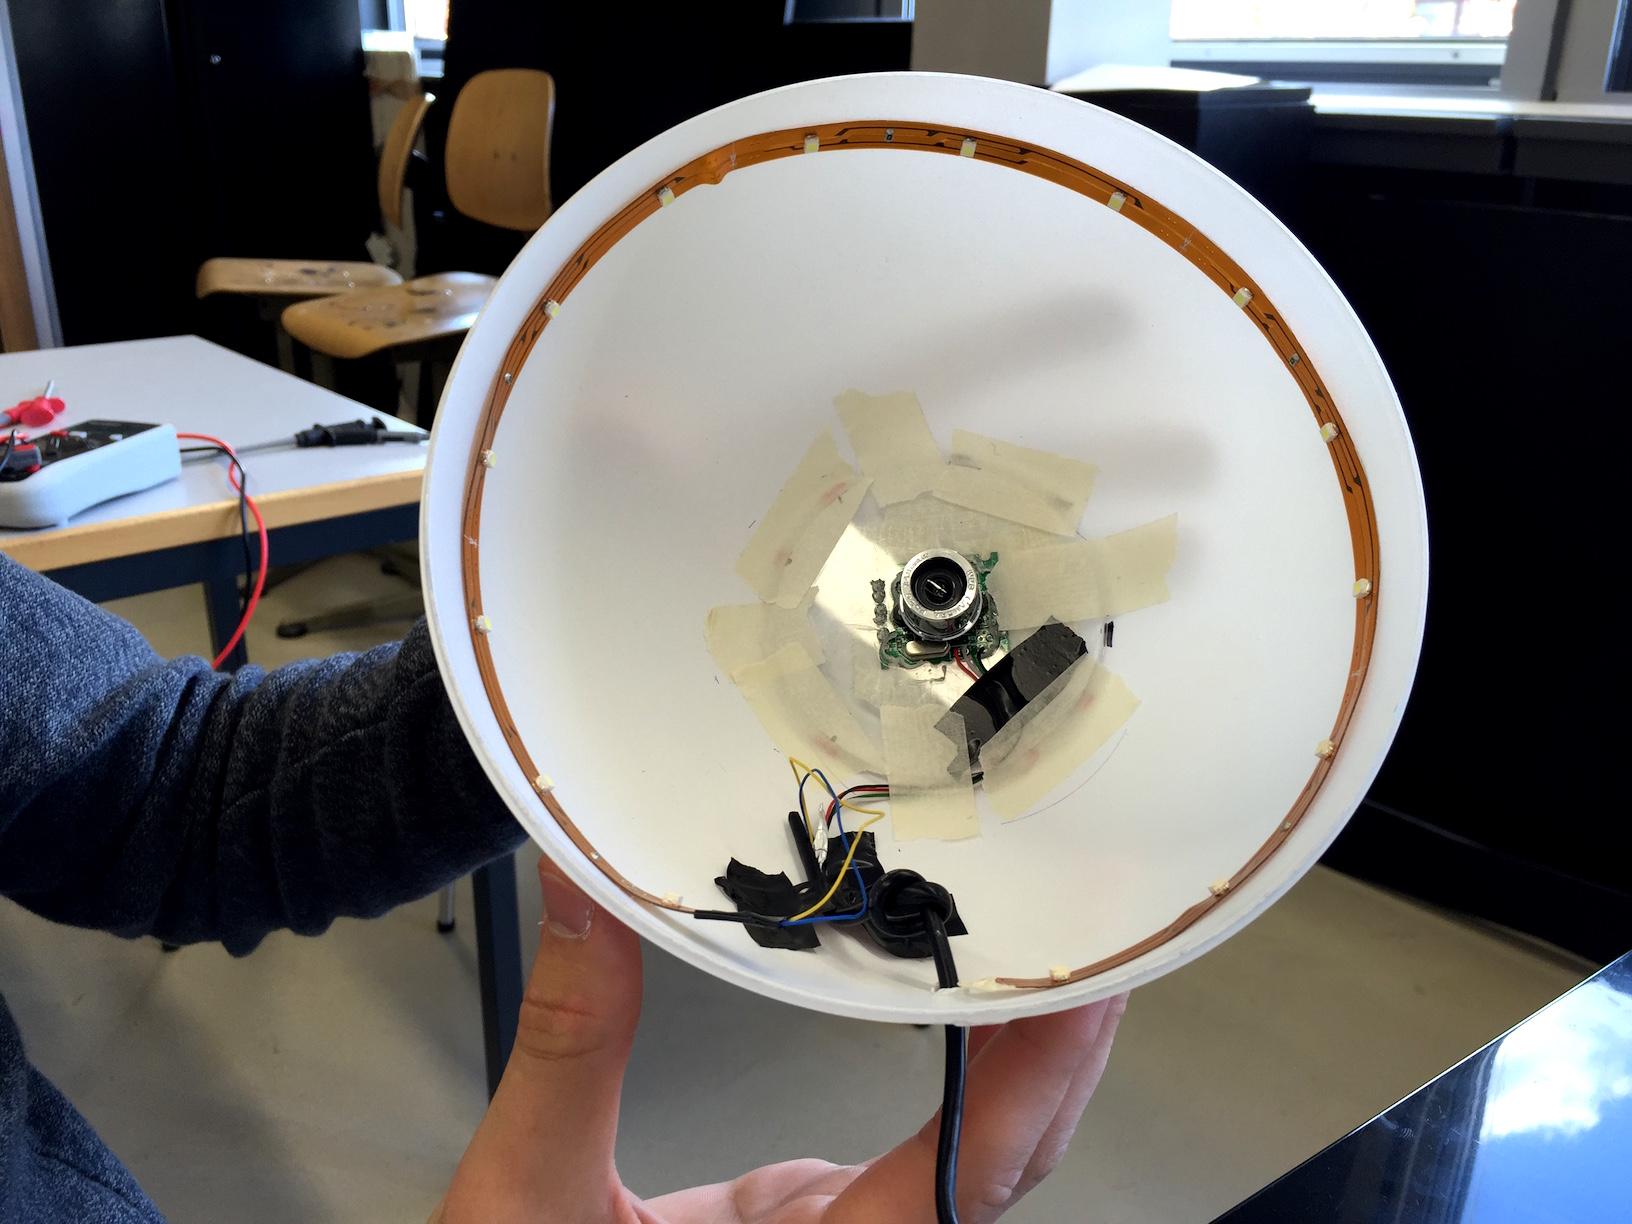 Controller inside